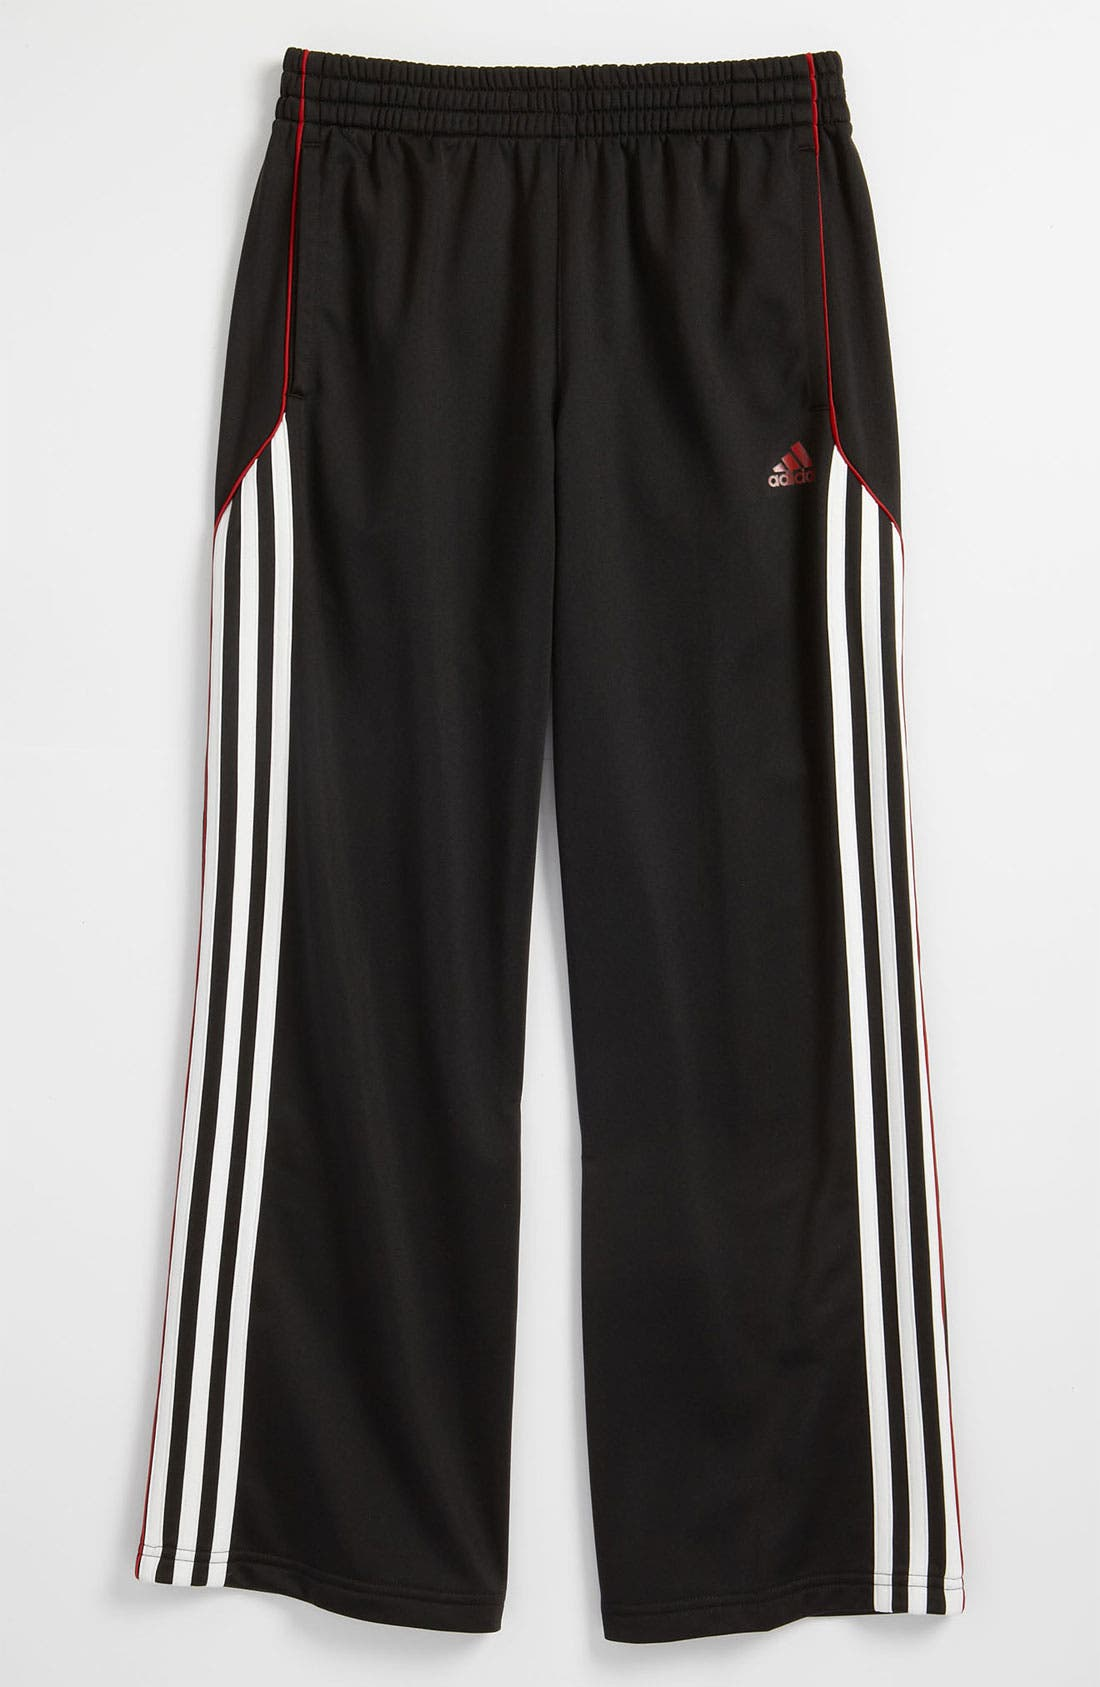 Main Image - adidas Tricot Pants (Big Boys)